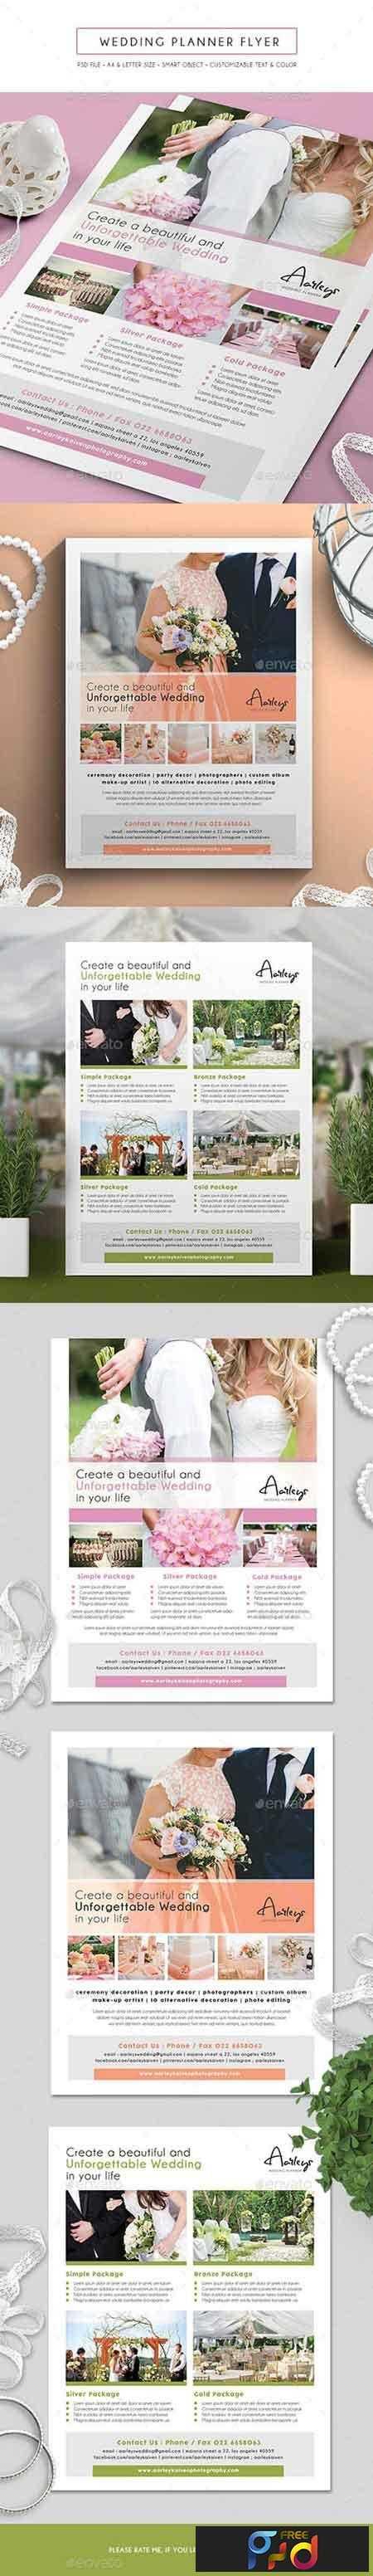 1808024 wedding planner flyer 15882193 freepsdvn